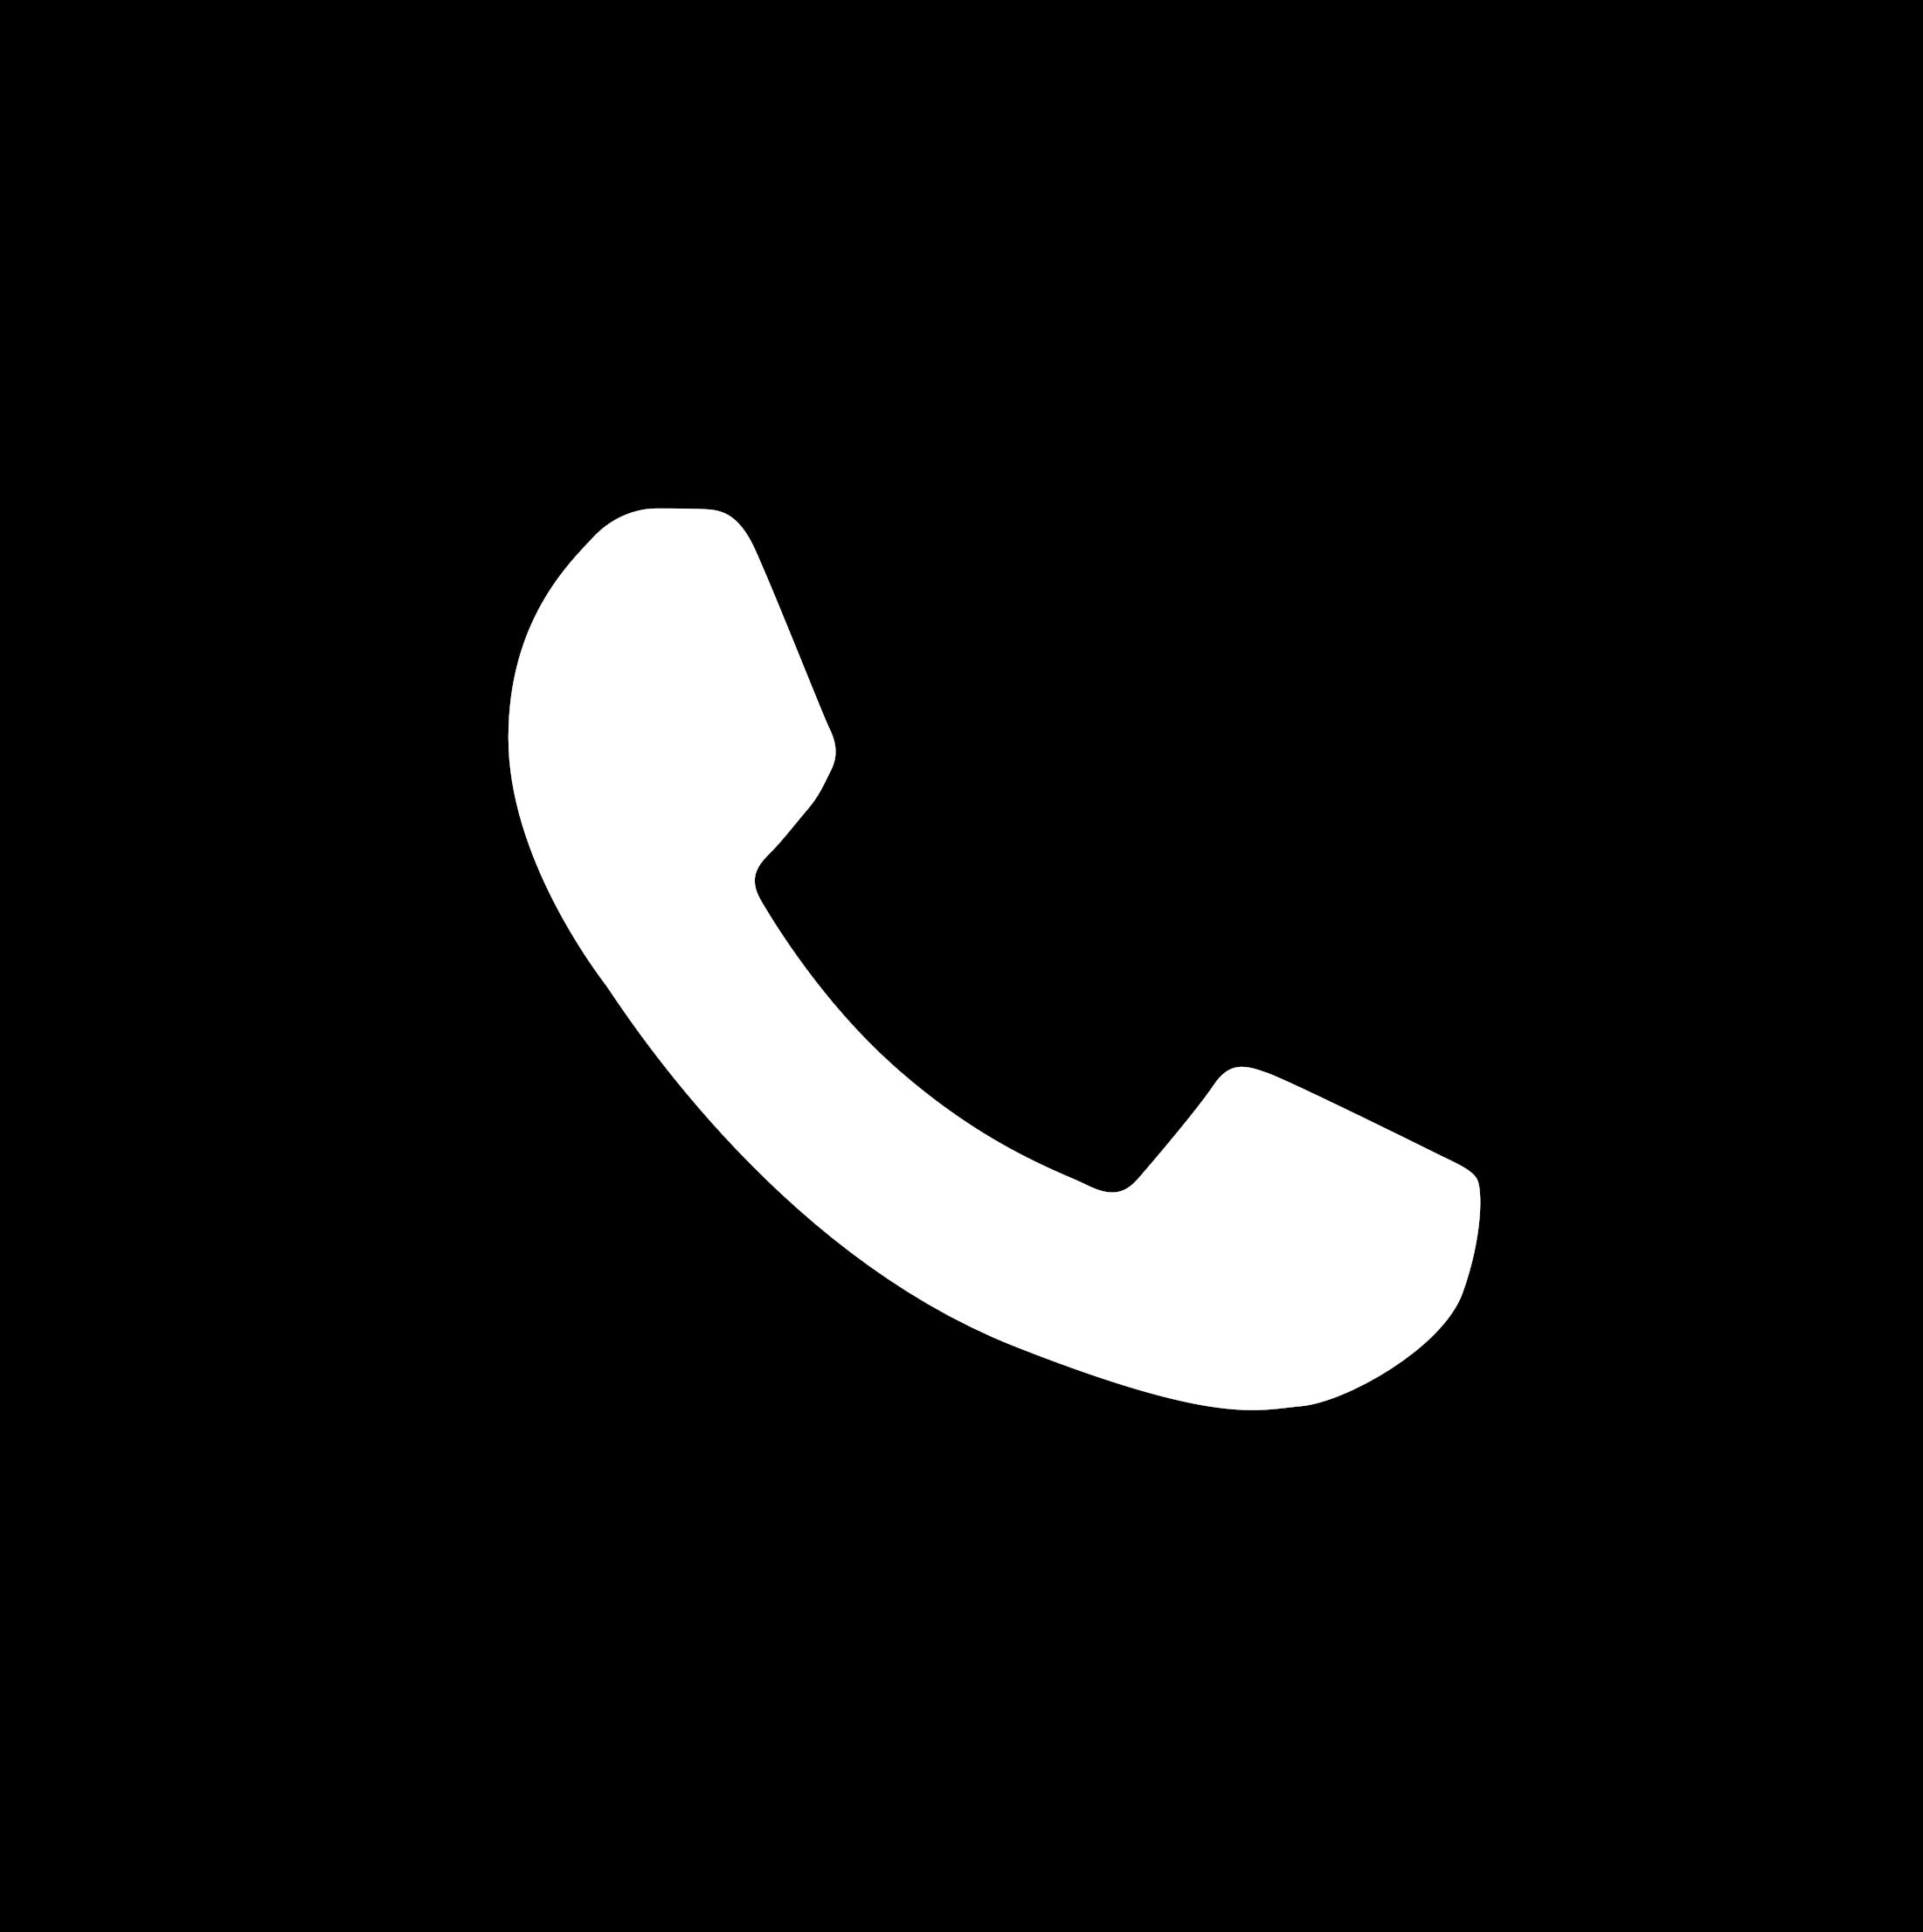 Download Whatsapp Logo Png Transparent - Logo Whatsapp Png - Full Pluspng.com  - Whatsapp Logo PNG